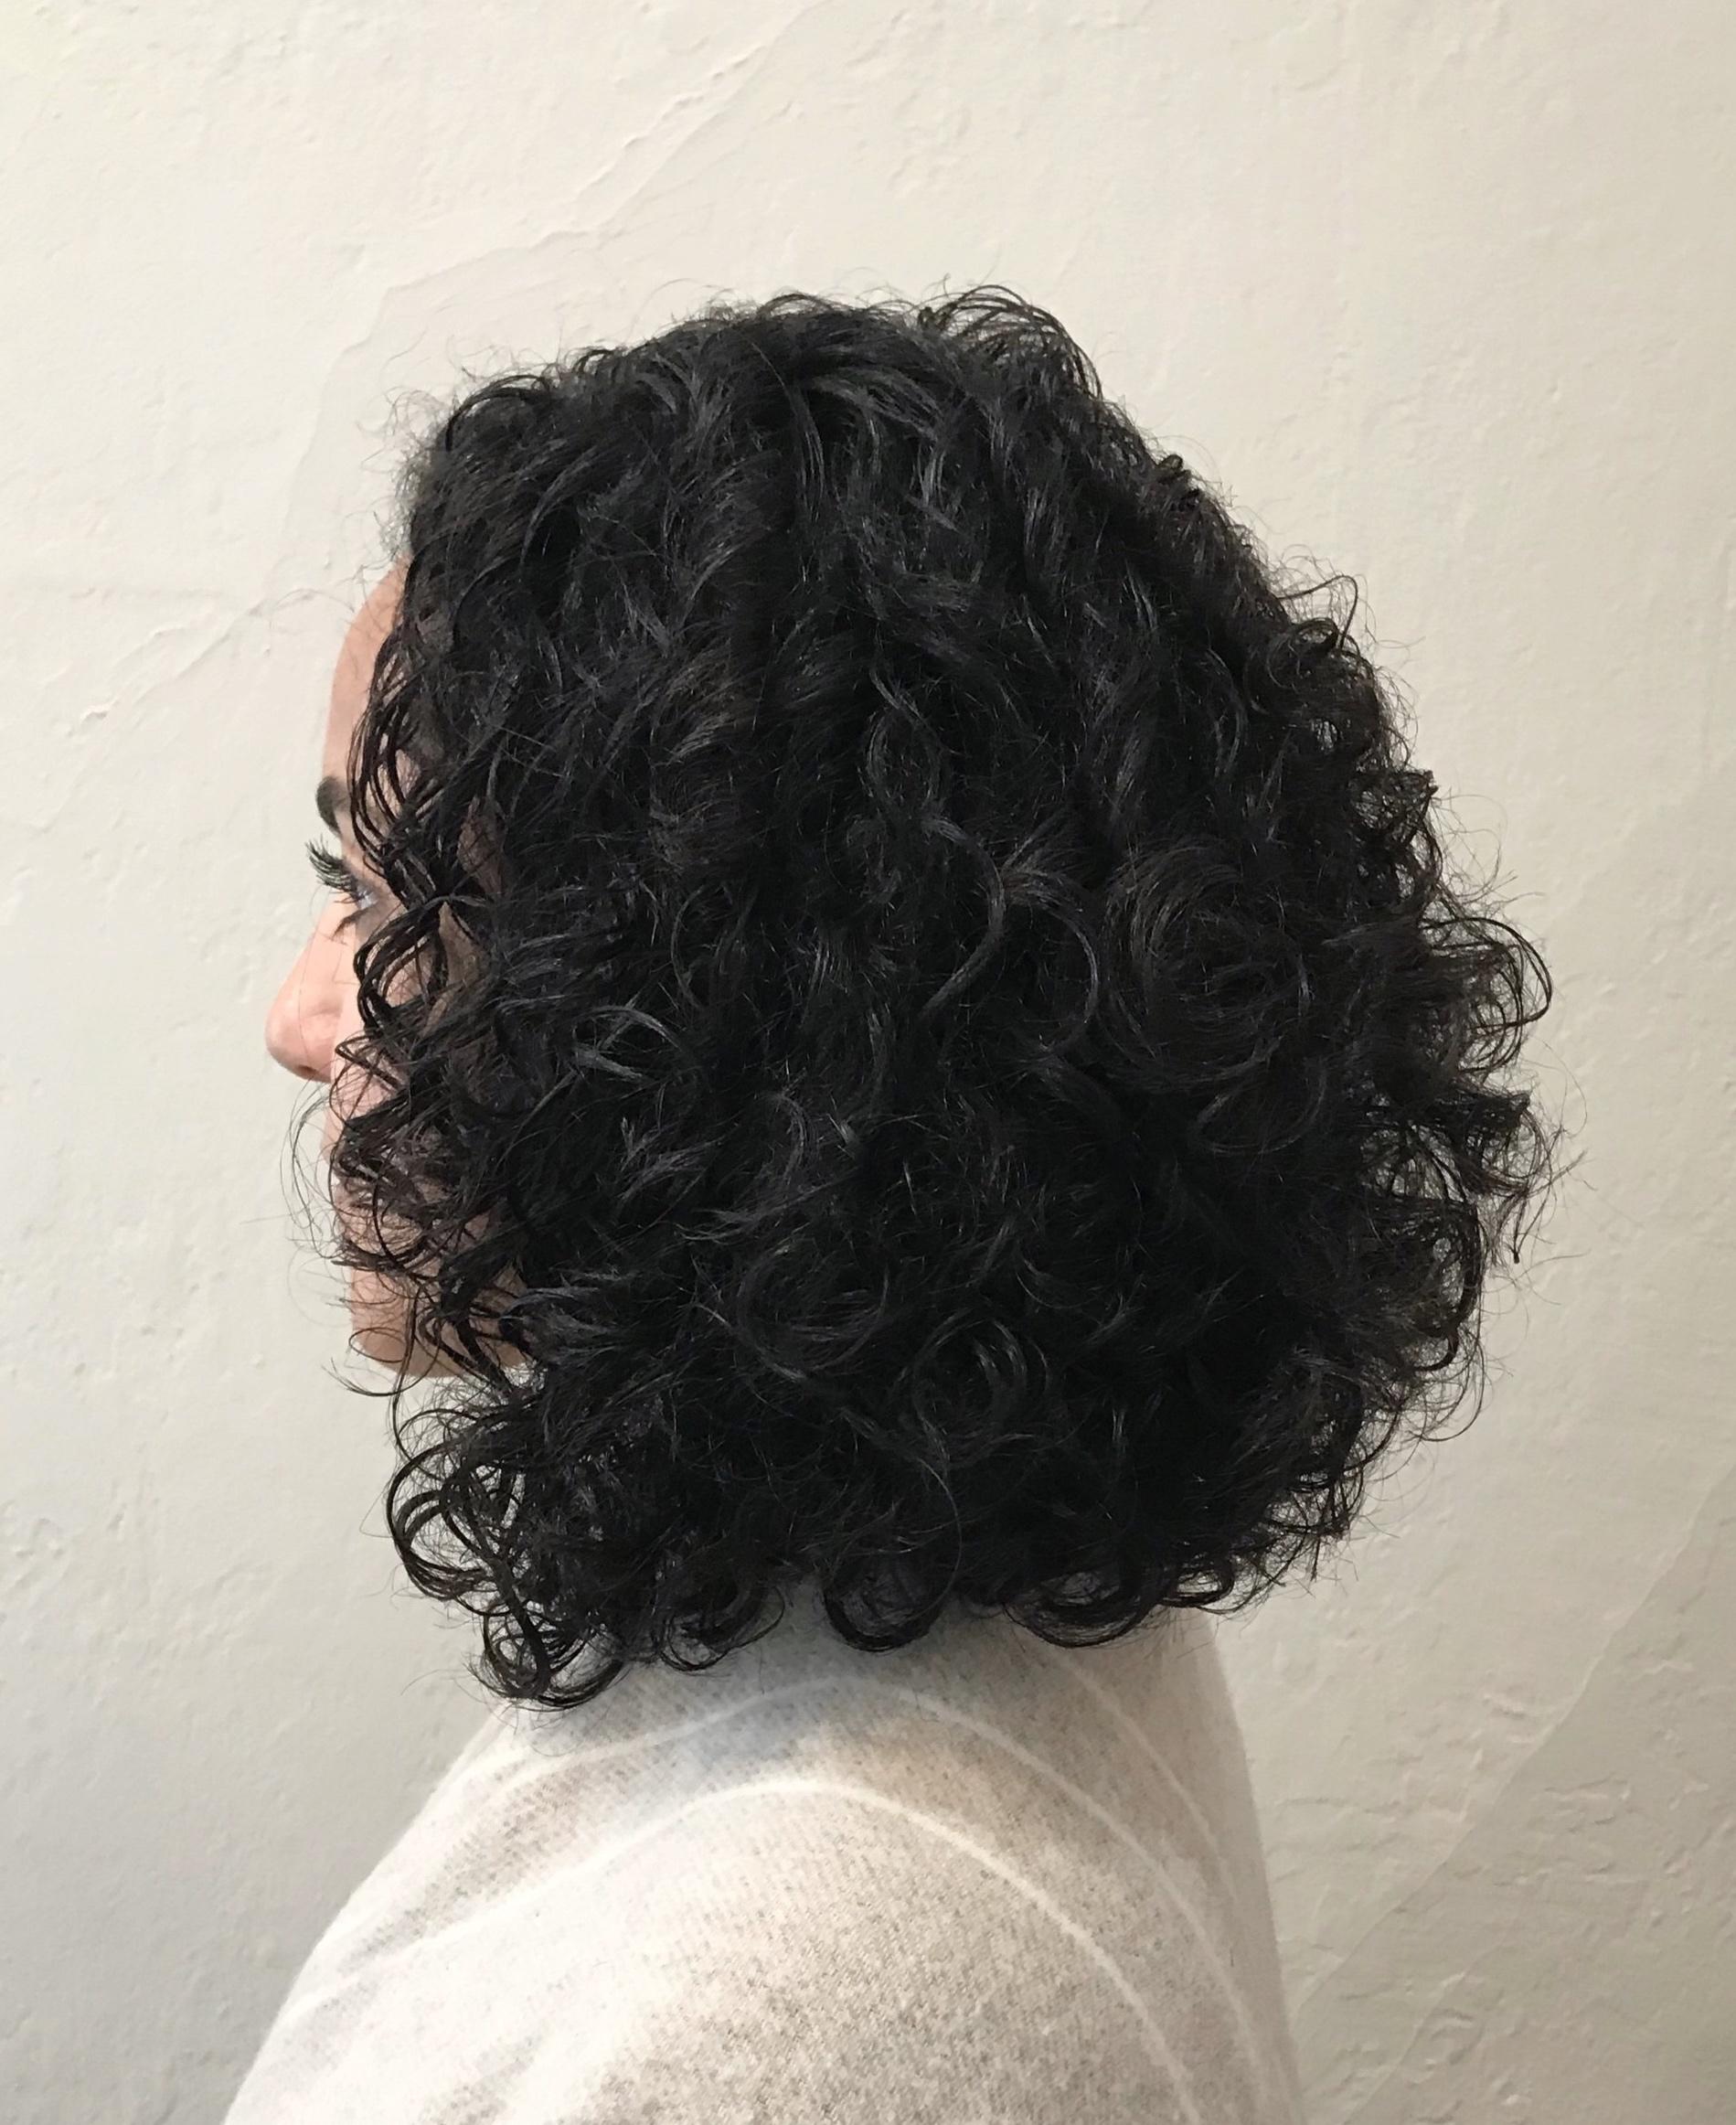 CurlyHair - 14.jpg